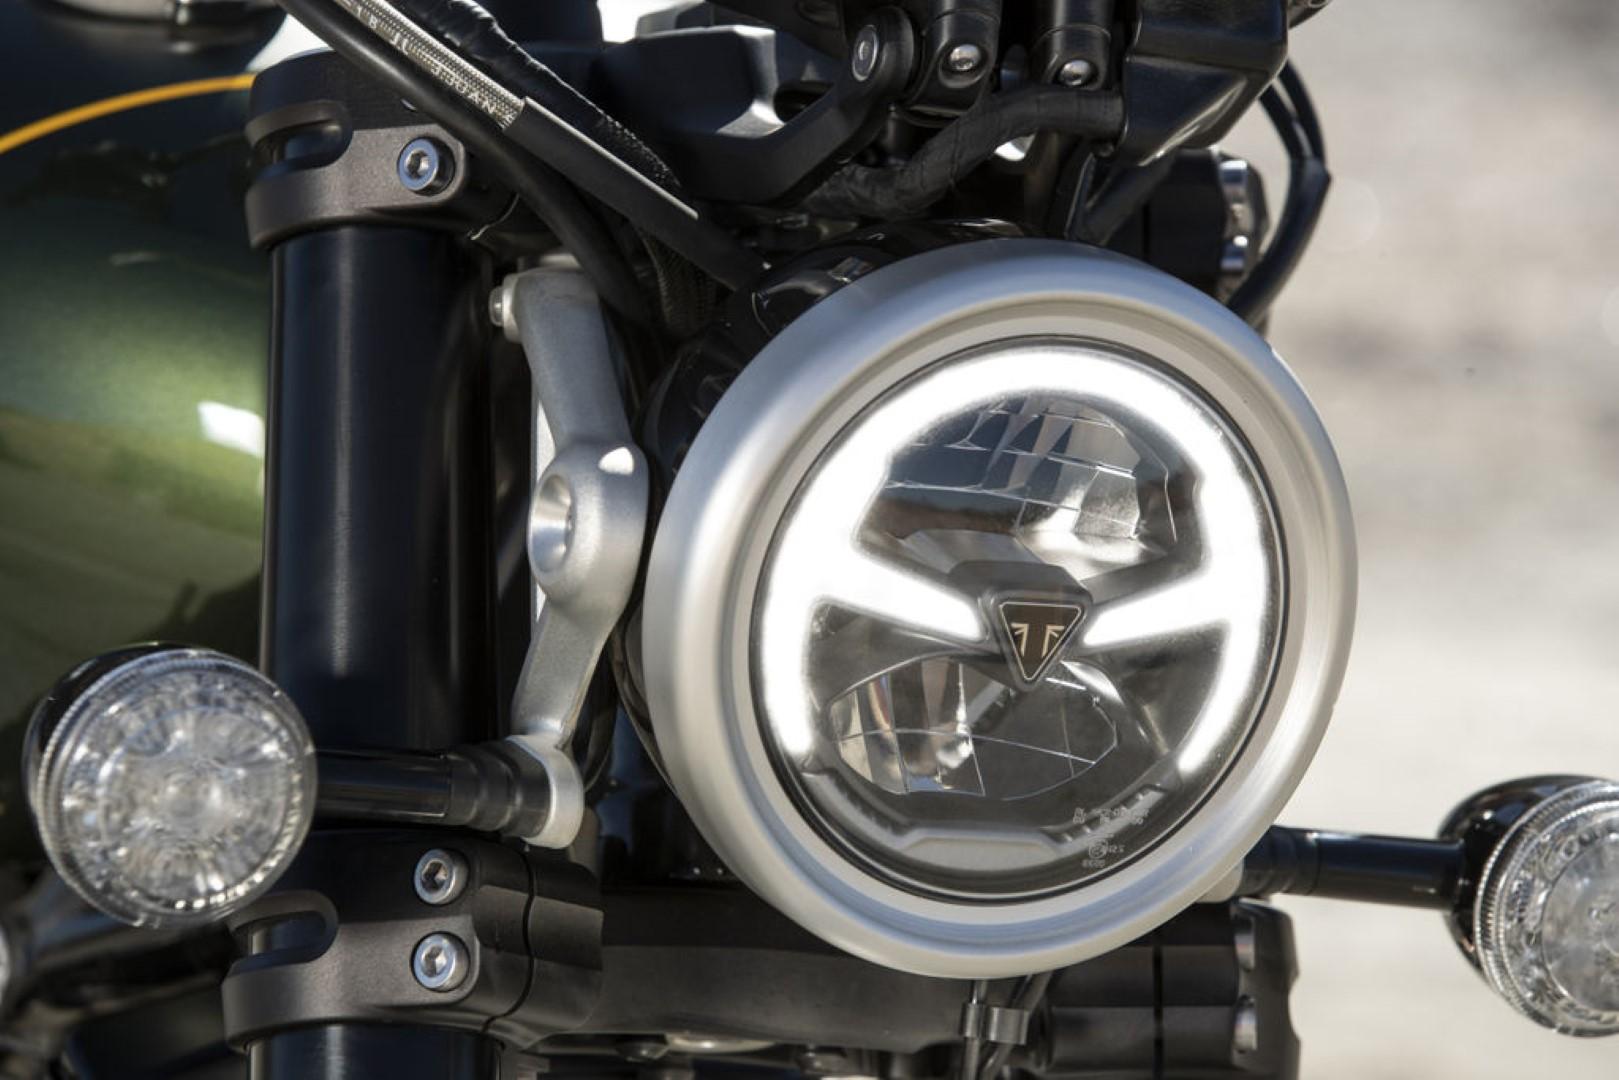 Triumph Scrambler 1200 XC y XE 2019. Fotos